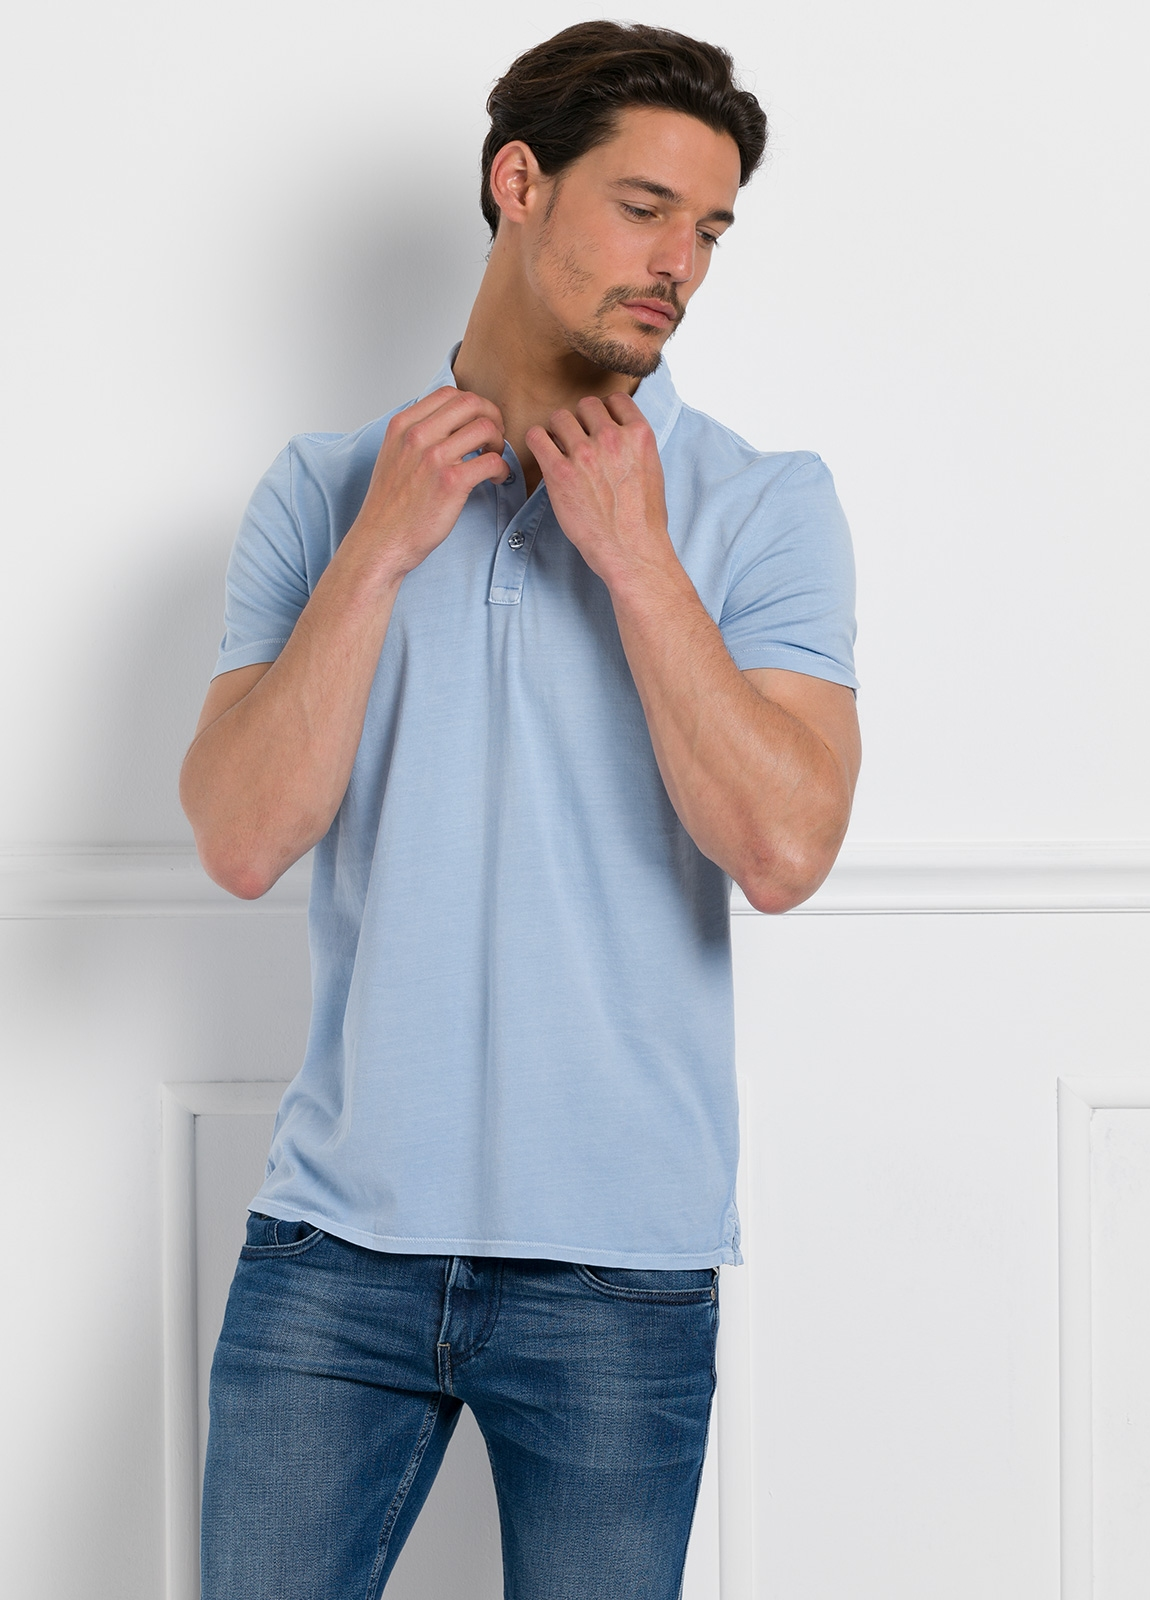 Polo liso manga corta, color azul celeste. 100% Algodón interlock. - Ítem1